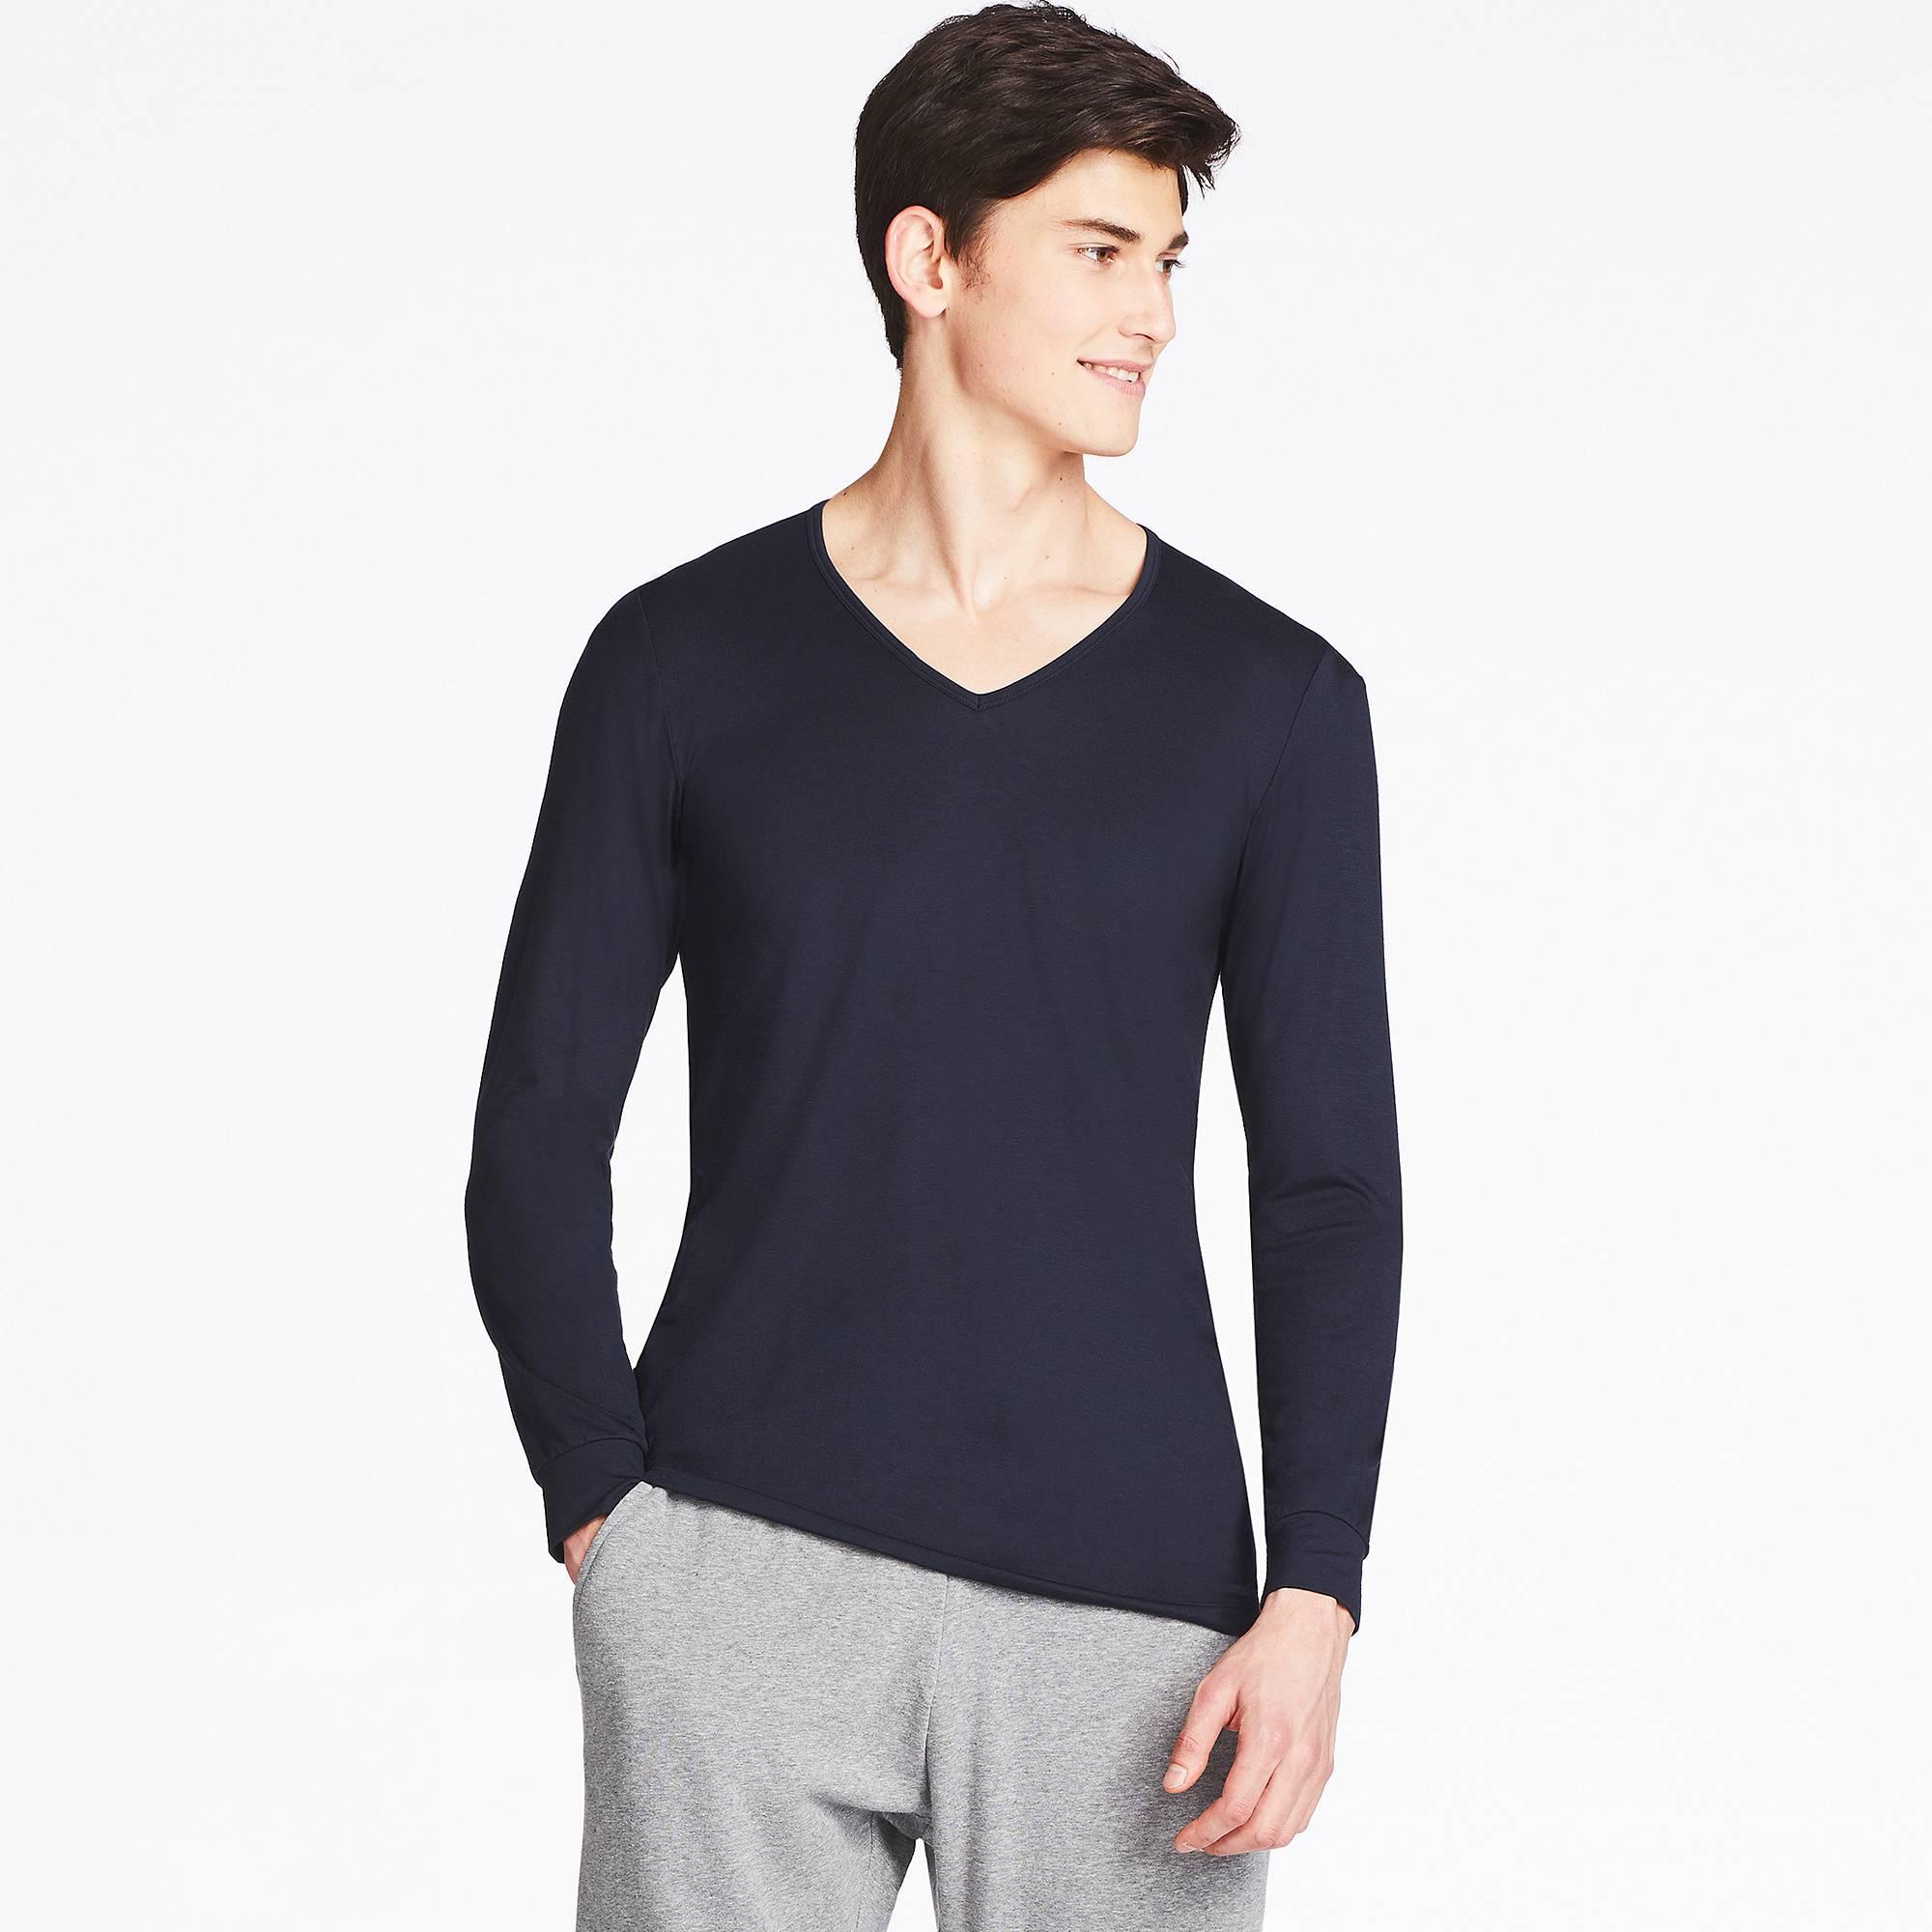 d2cb9f1b8 Mens V Neck Sleeveless T Shirts - DREAMWORKS